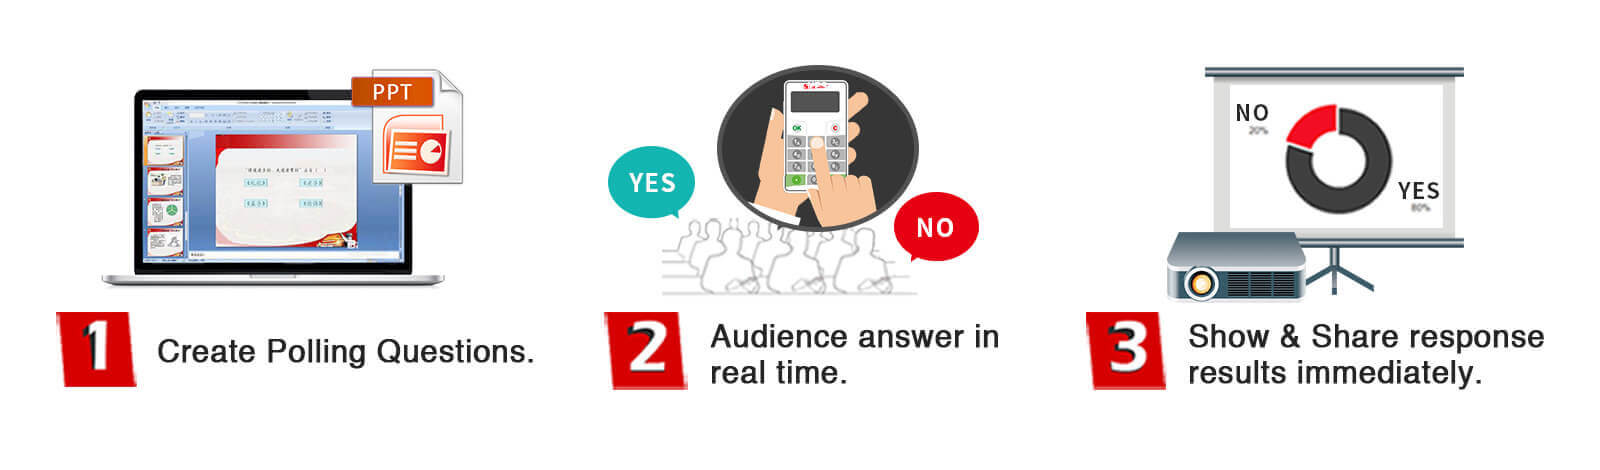 audience response equipment